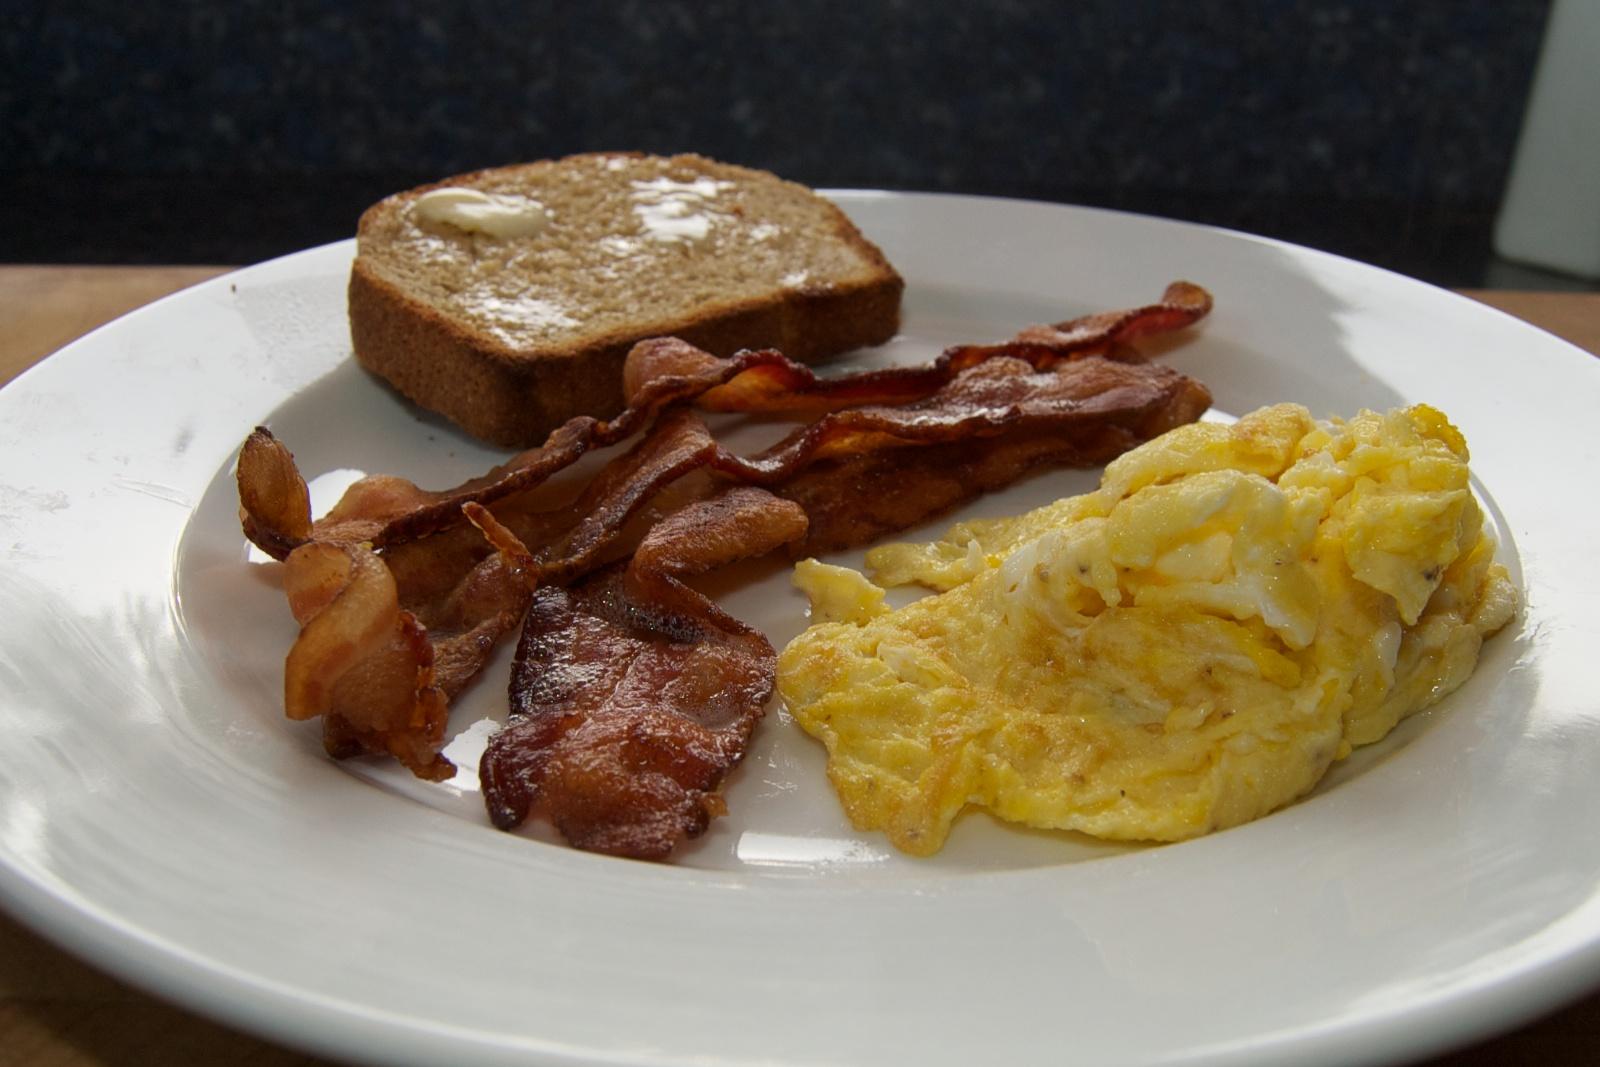 http://blog.rickk.com/food/2011/06/07/ate.2011.06.07.b.jpg